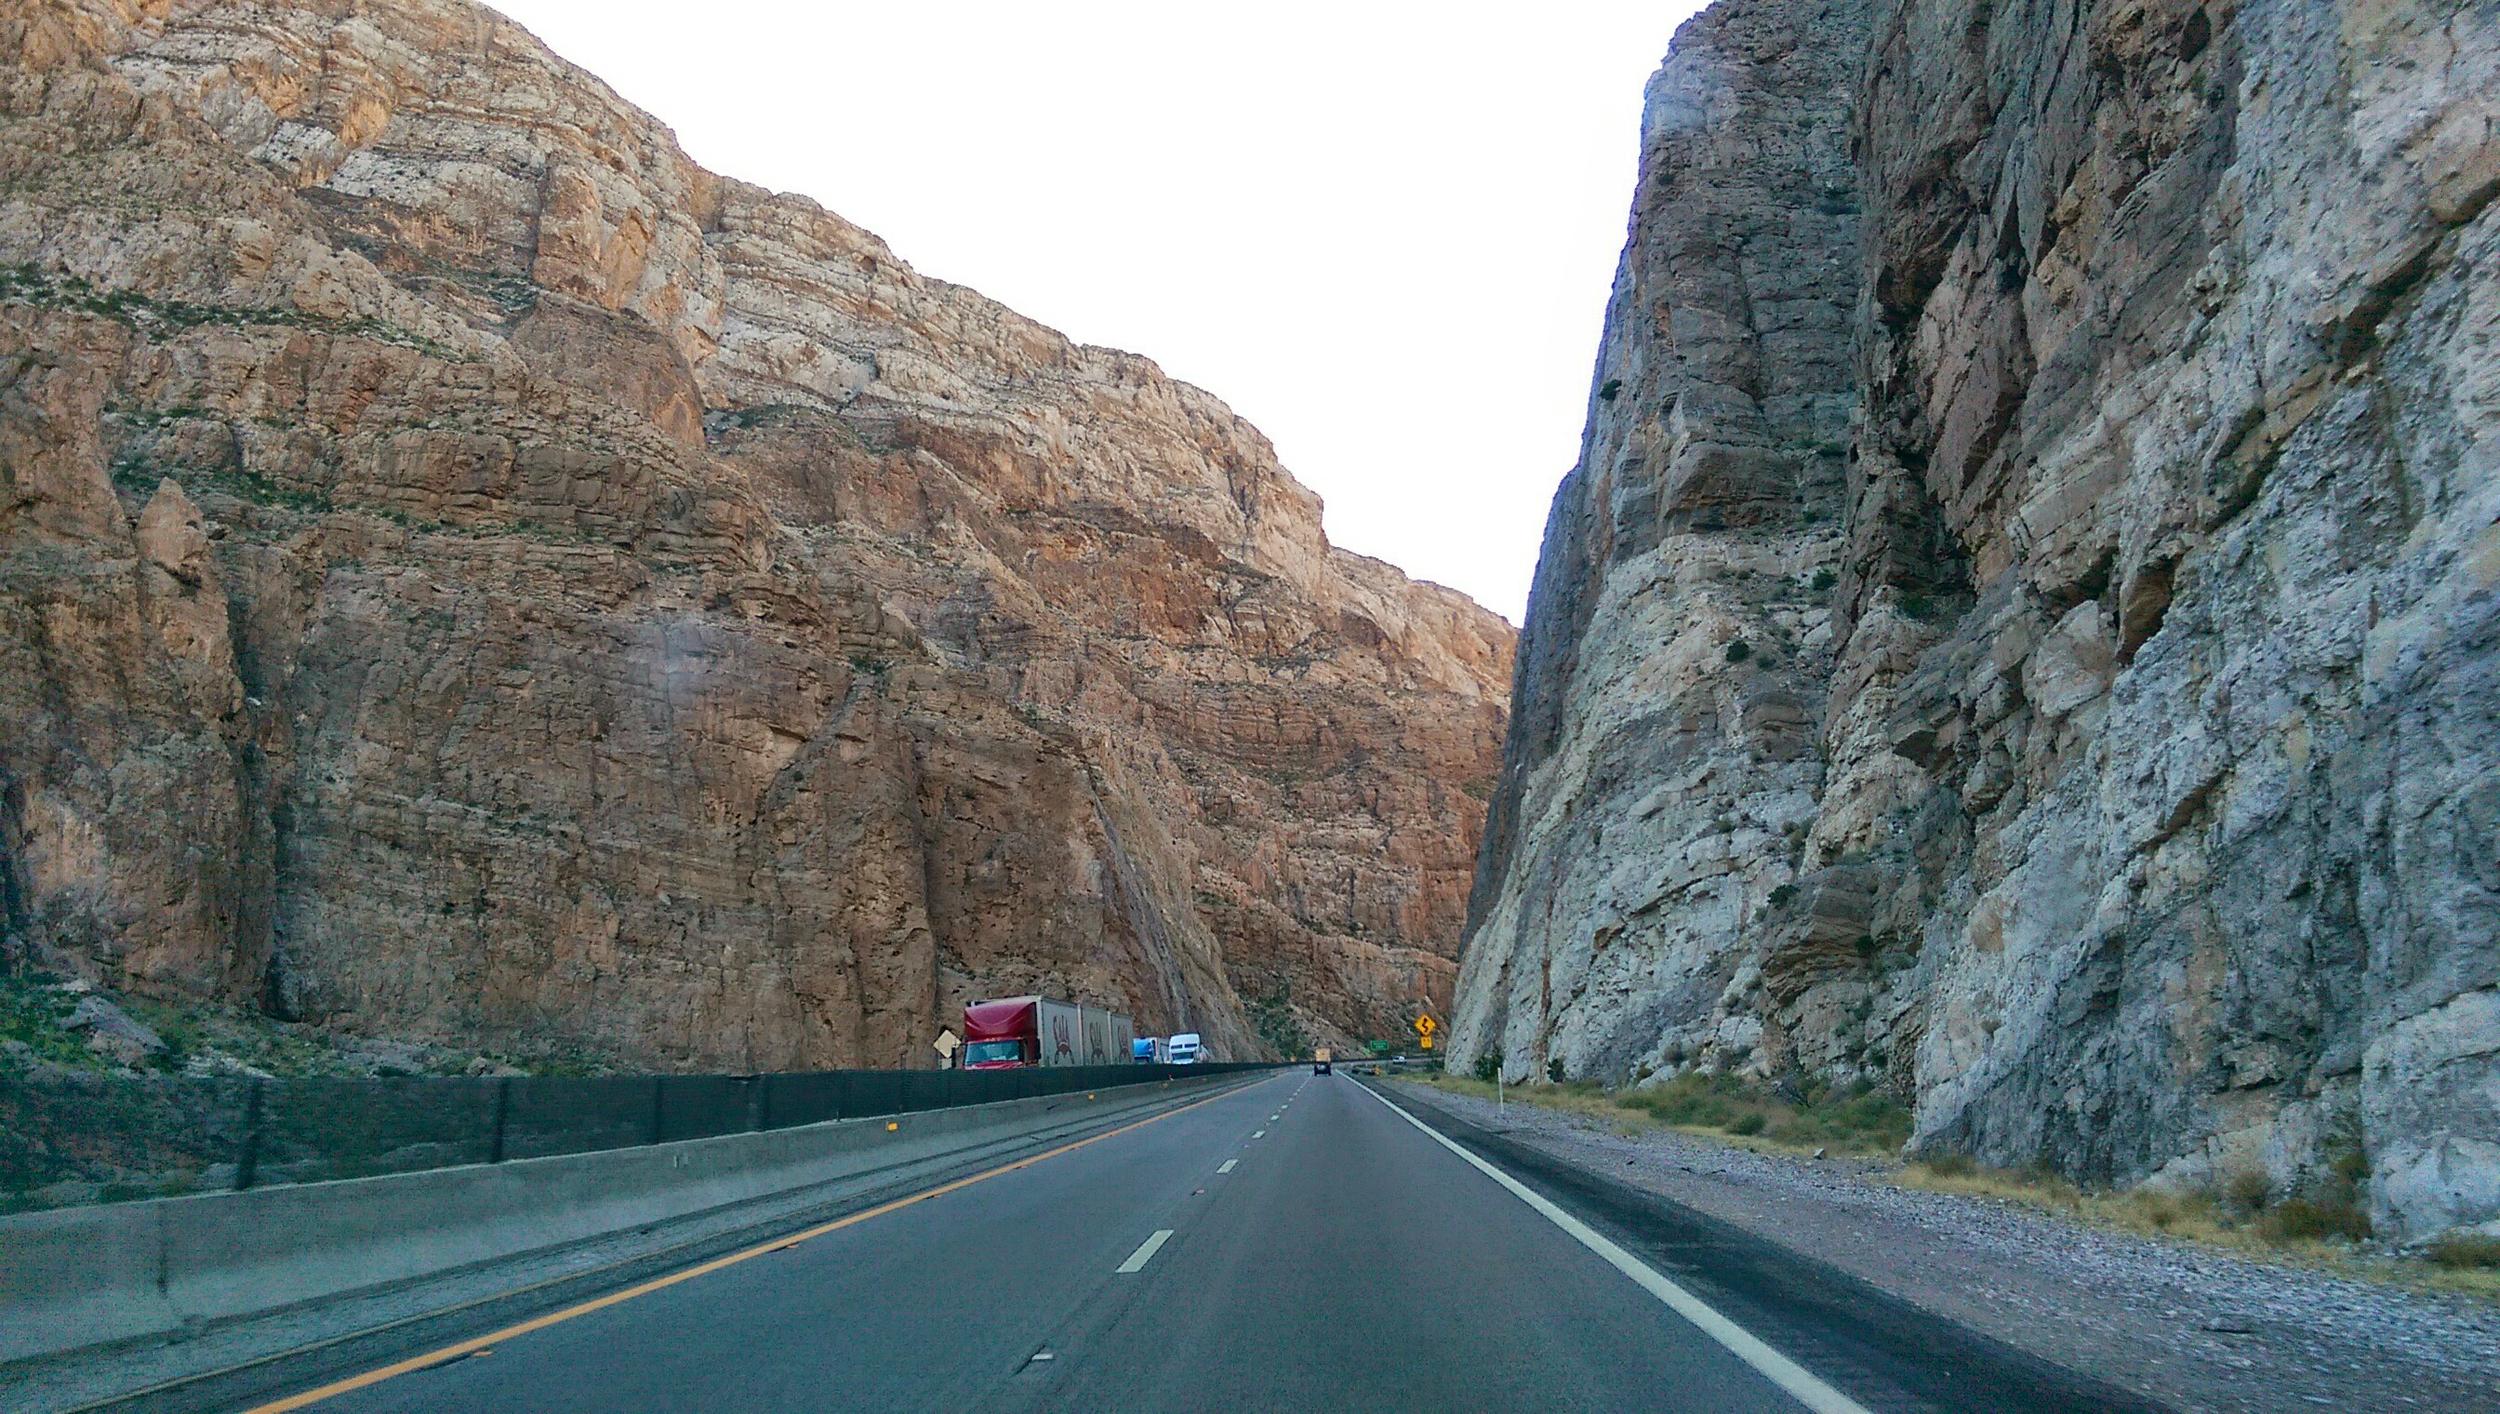 Gorgeous canyon drive in Arizona!